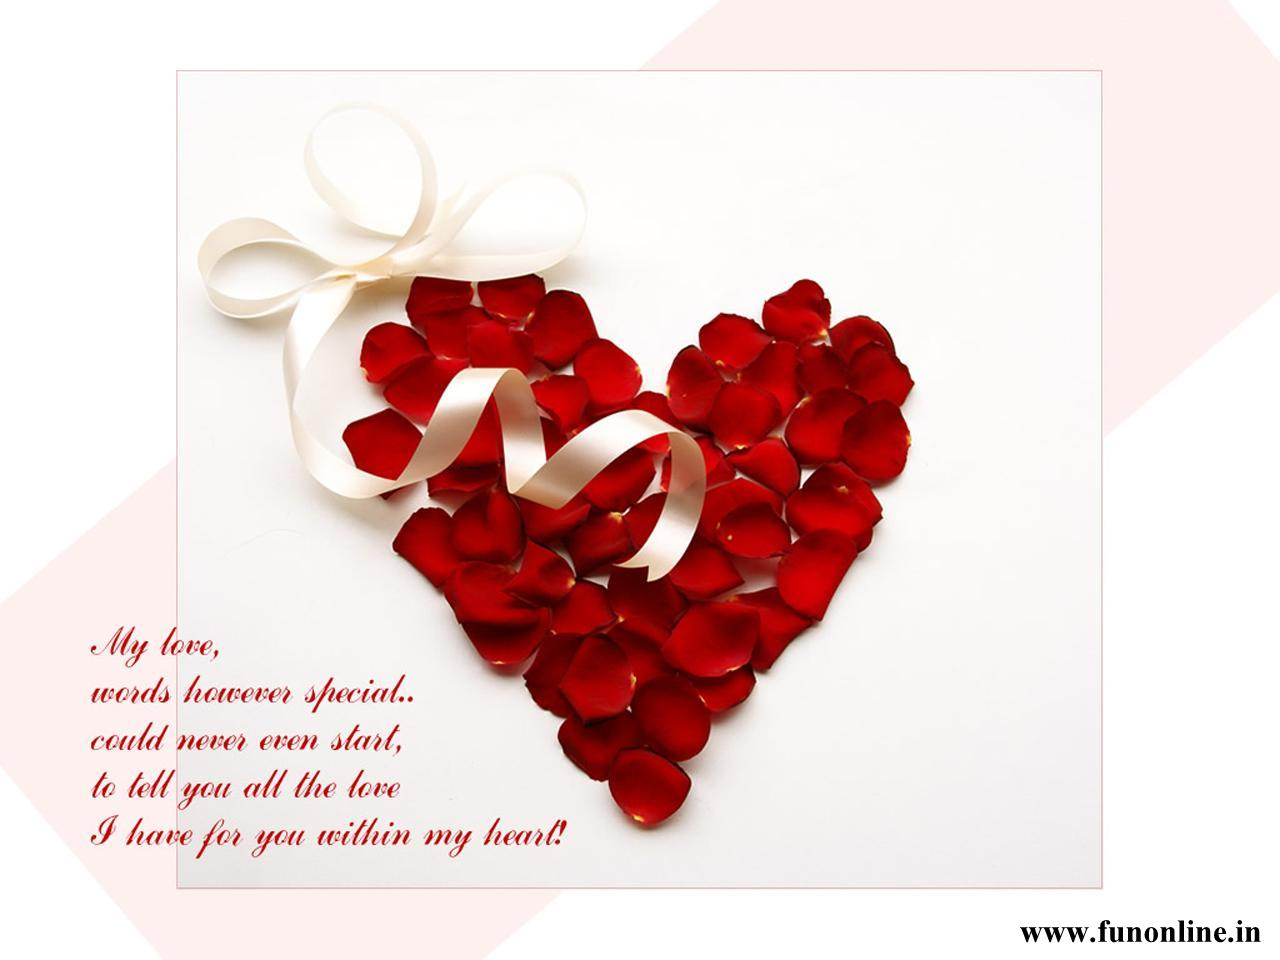 Love Heart Wallpapers Loving Hearts Cute Love Wallpapers Love Poem X